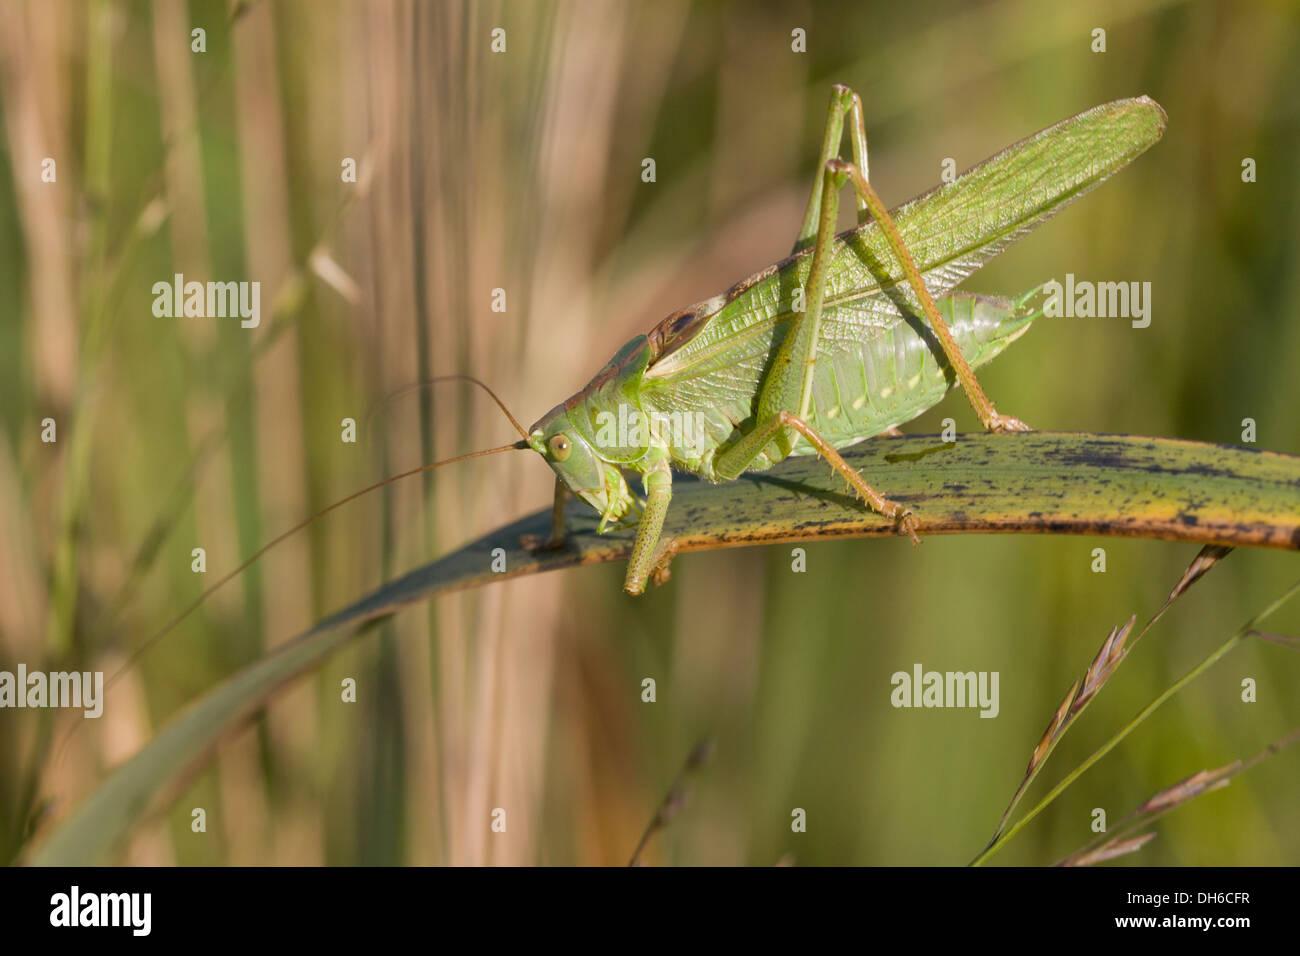 Große grüne Bush-Cricket - Tettigonia Viridissima. Männlich Stockbild